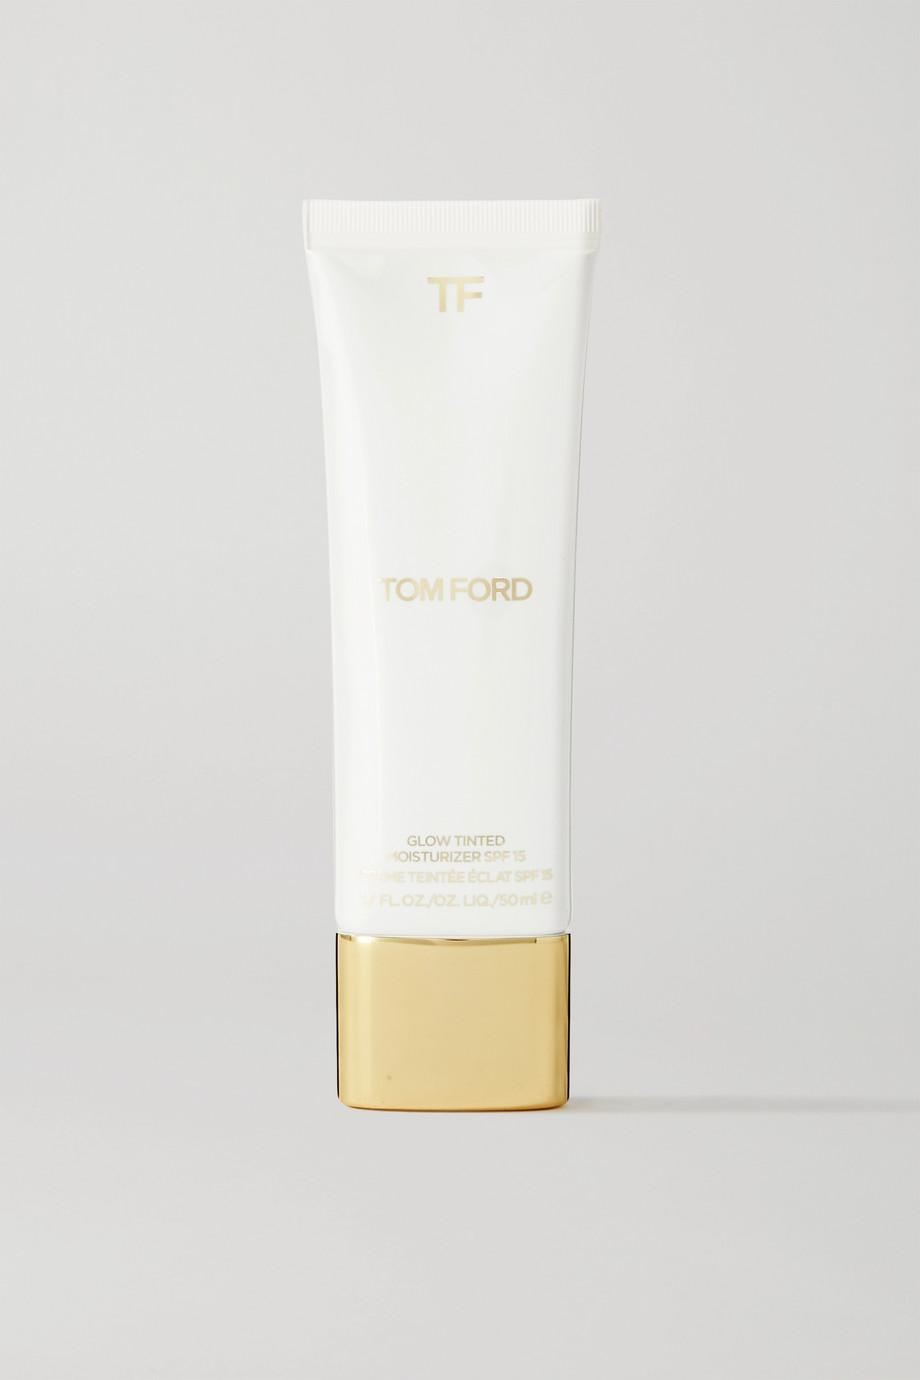 TOM FORD BEAUTY Glow Tinted Moisturizer LSF 15 – 12.0 Macassar, 50 ml – Getönte Feuchtigkeitscreme